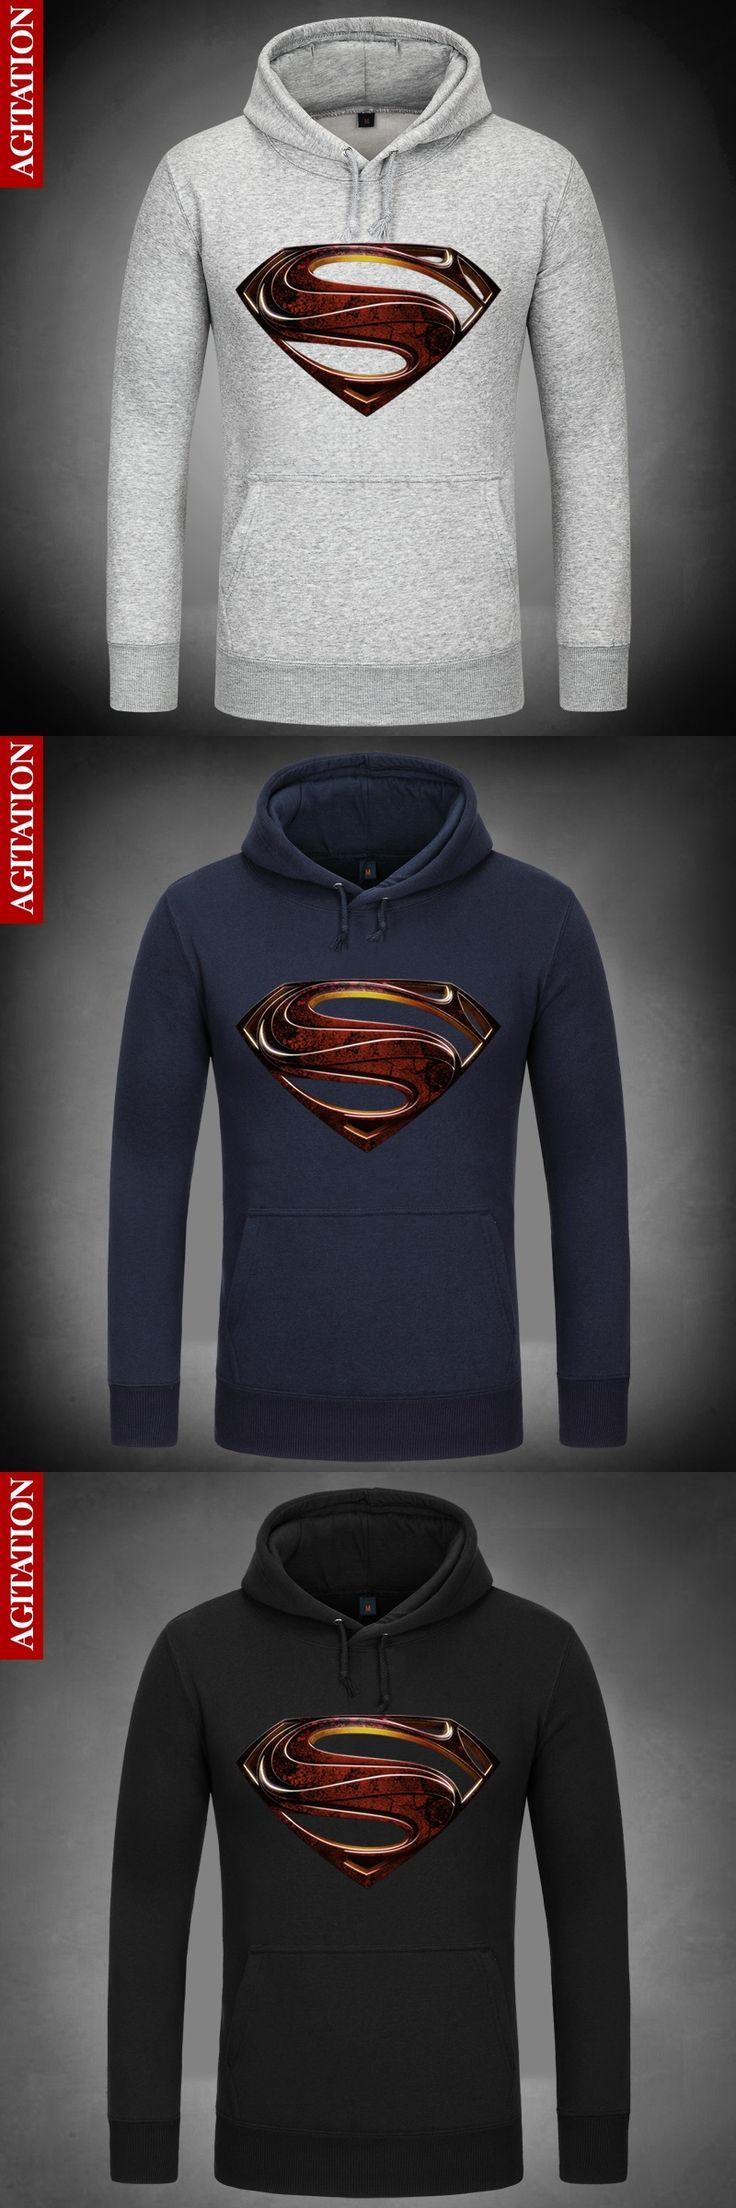 Man of Steel (Film) Superman Symbolize Hoody Coat Pullover Hoodies Sweatshirt DC Comics  Sweatshirts Outerwear Clothes